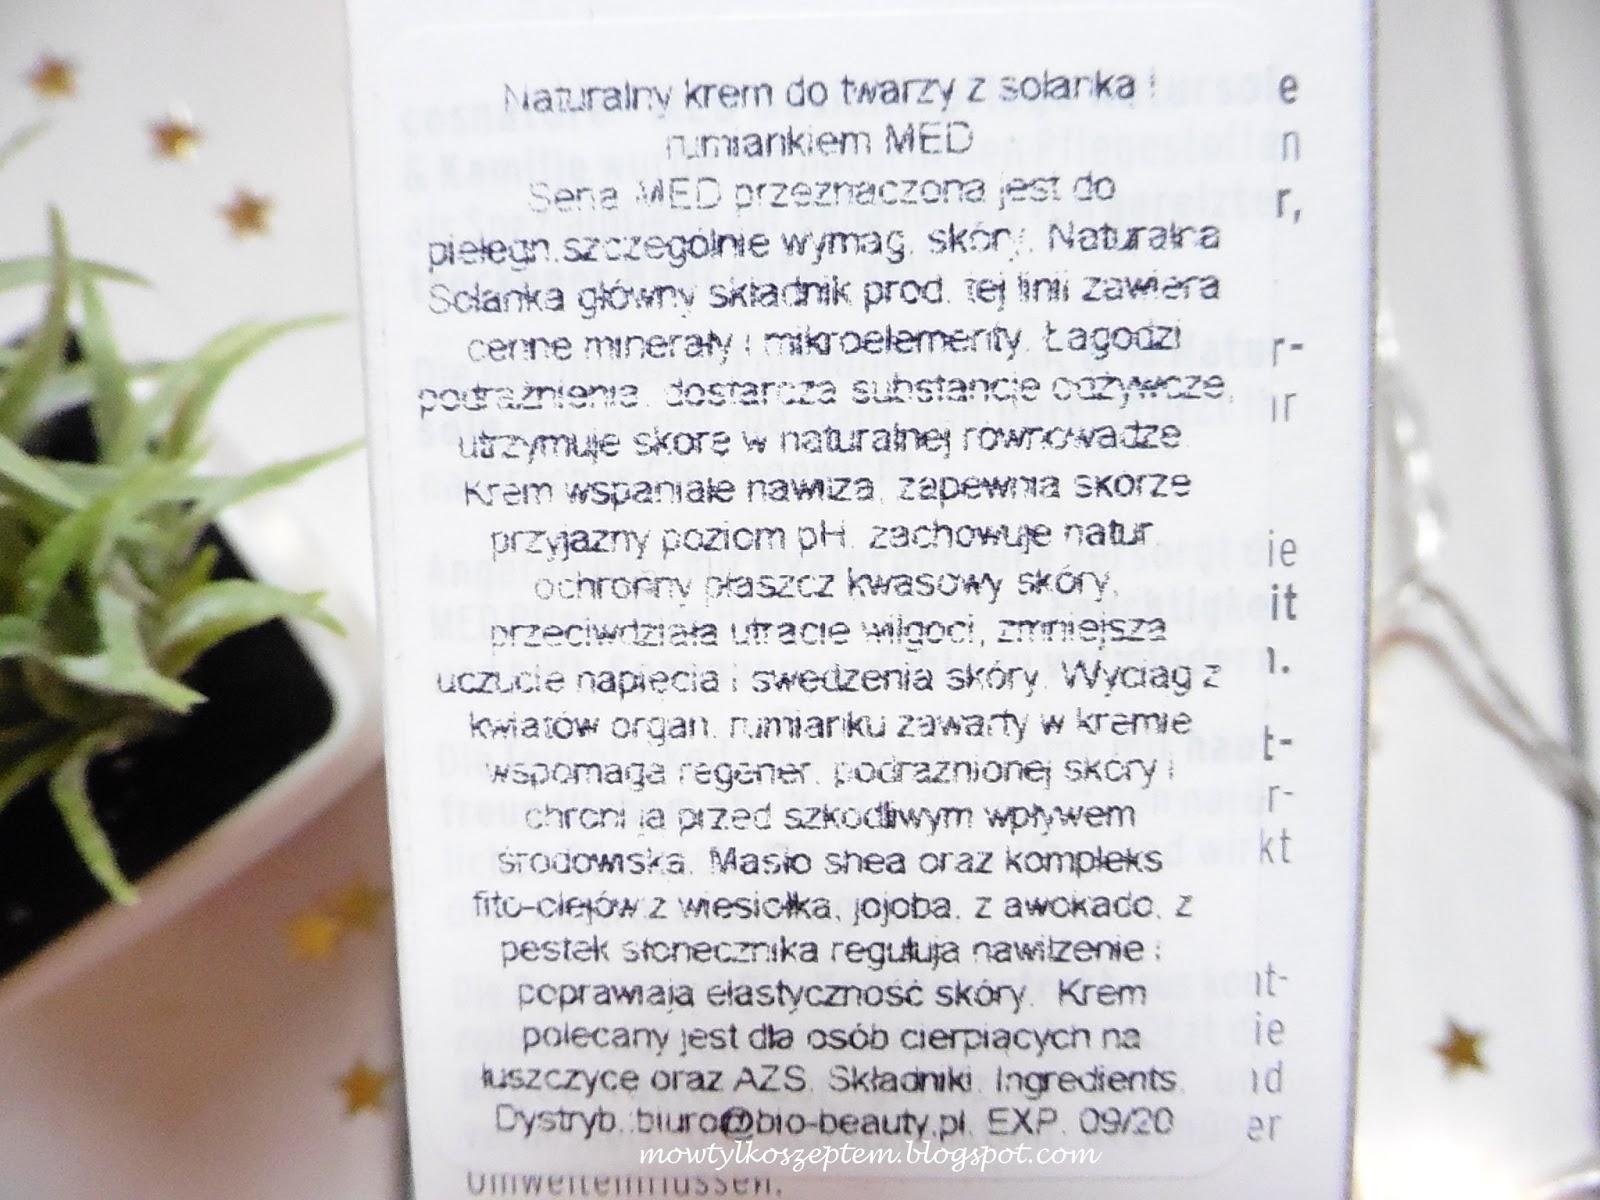 cosnature-krem-do-twarzy-z-solanka-i-rumiankiem-med